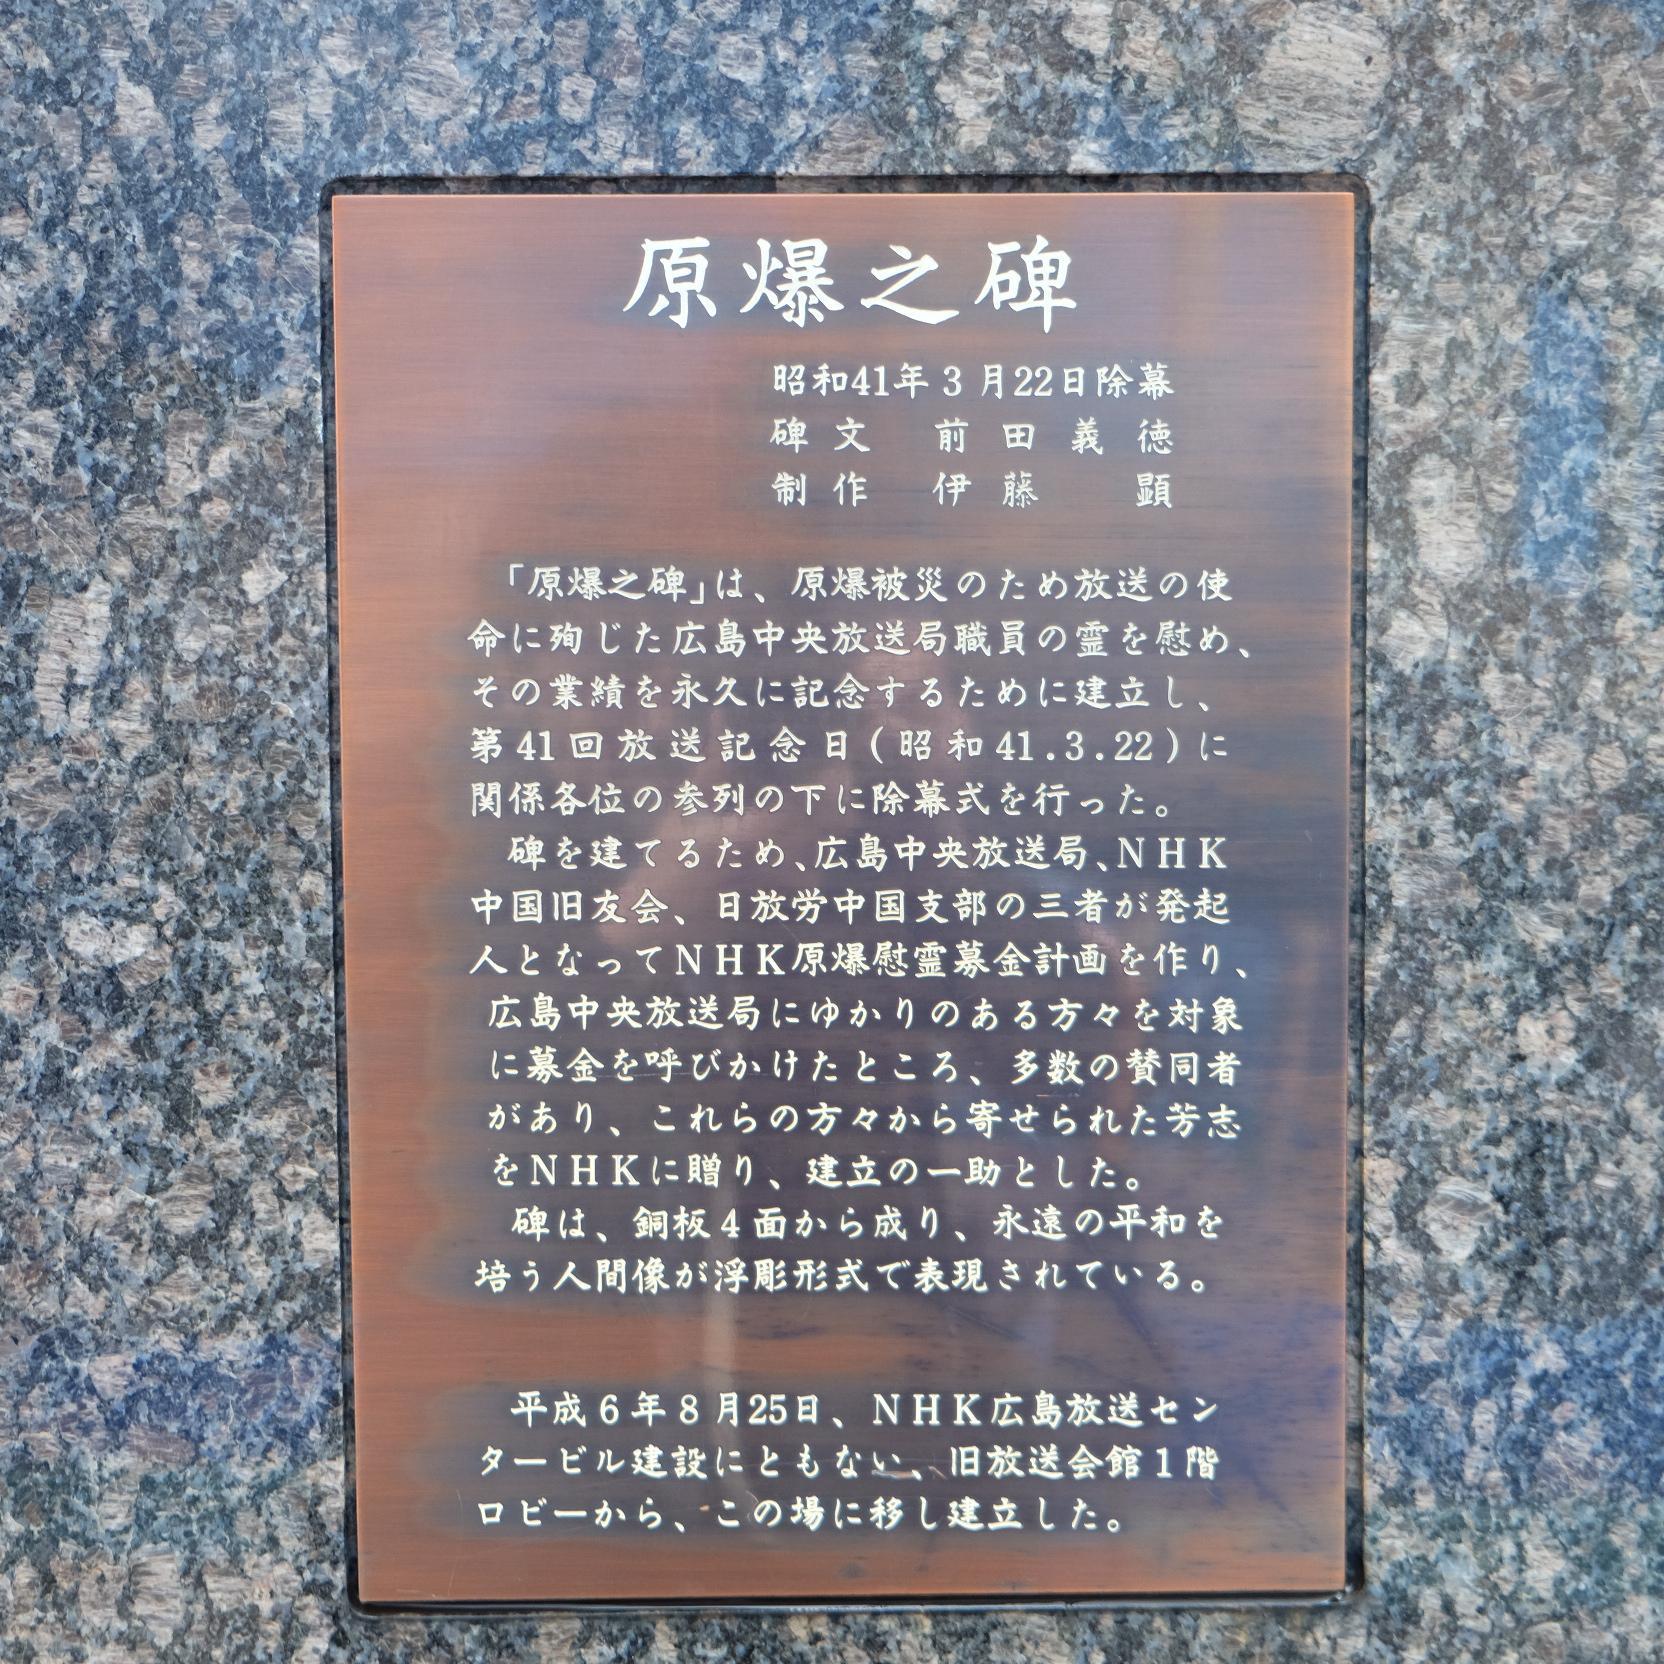 NHK原爆の碑